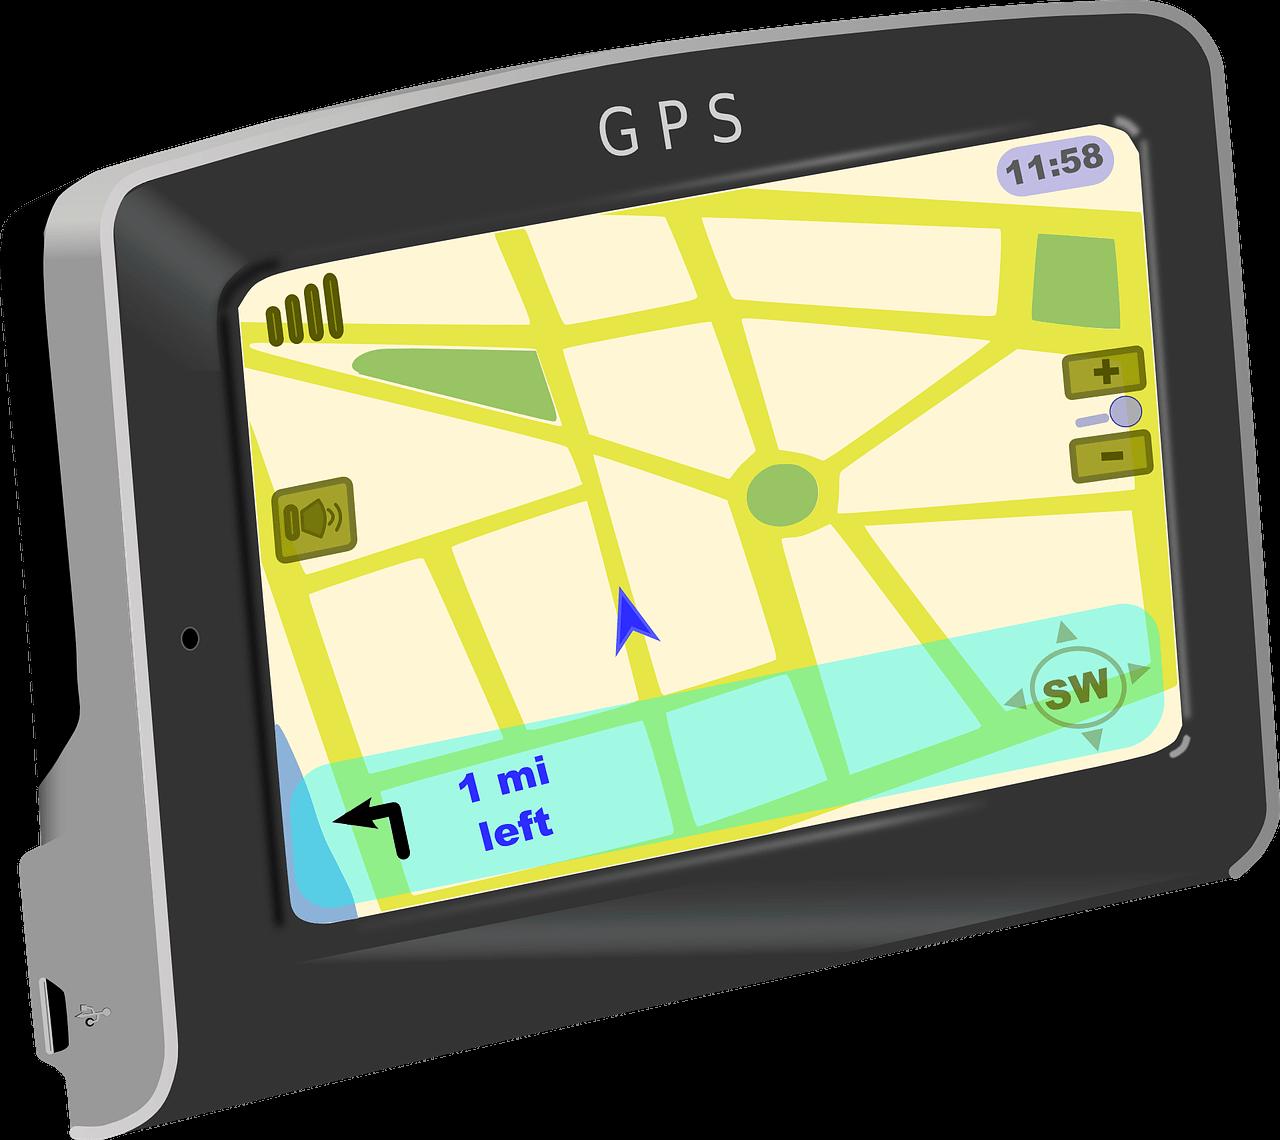 GPS Coordinates for Mizen Head Visitor Centre